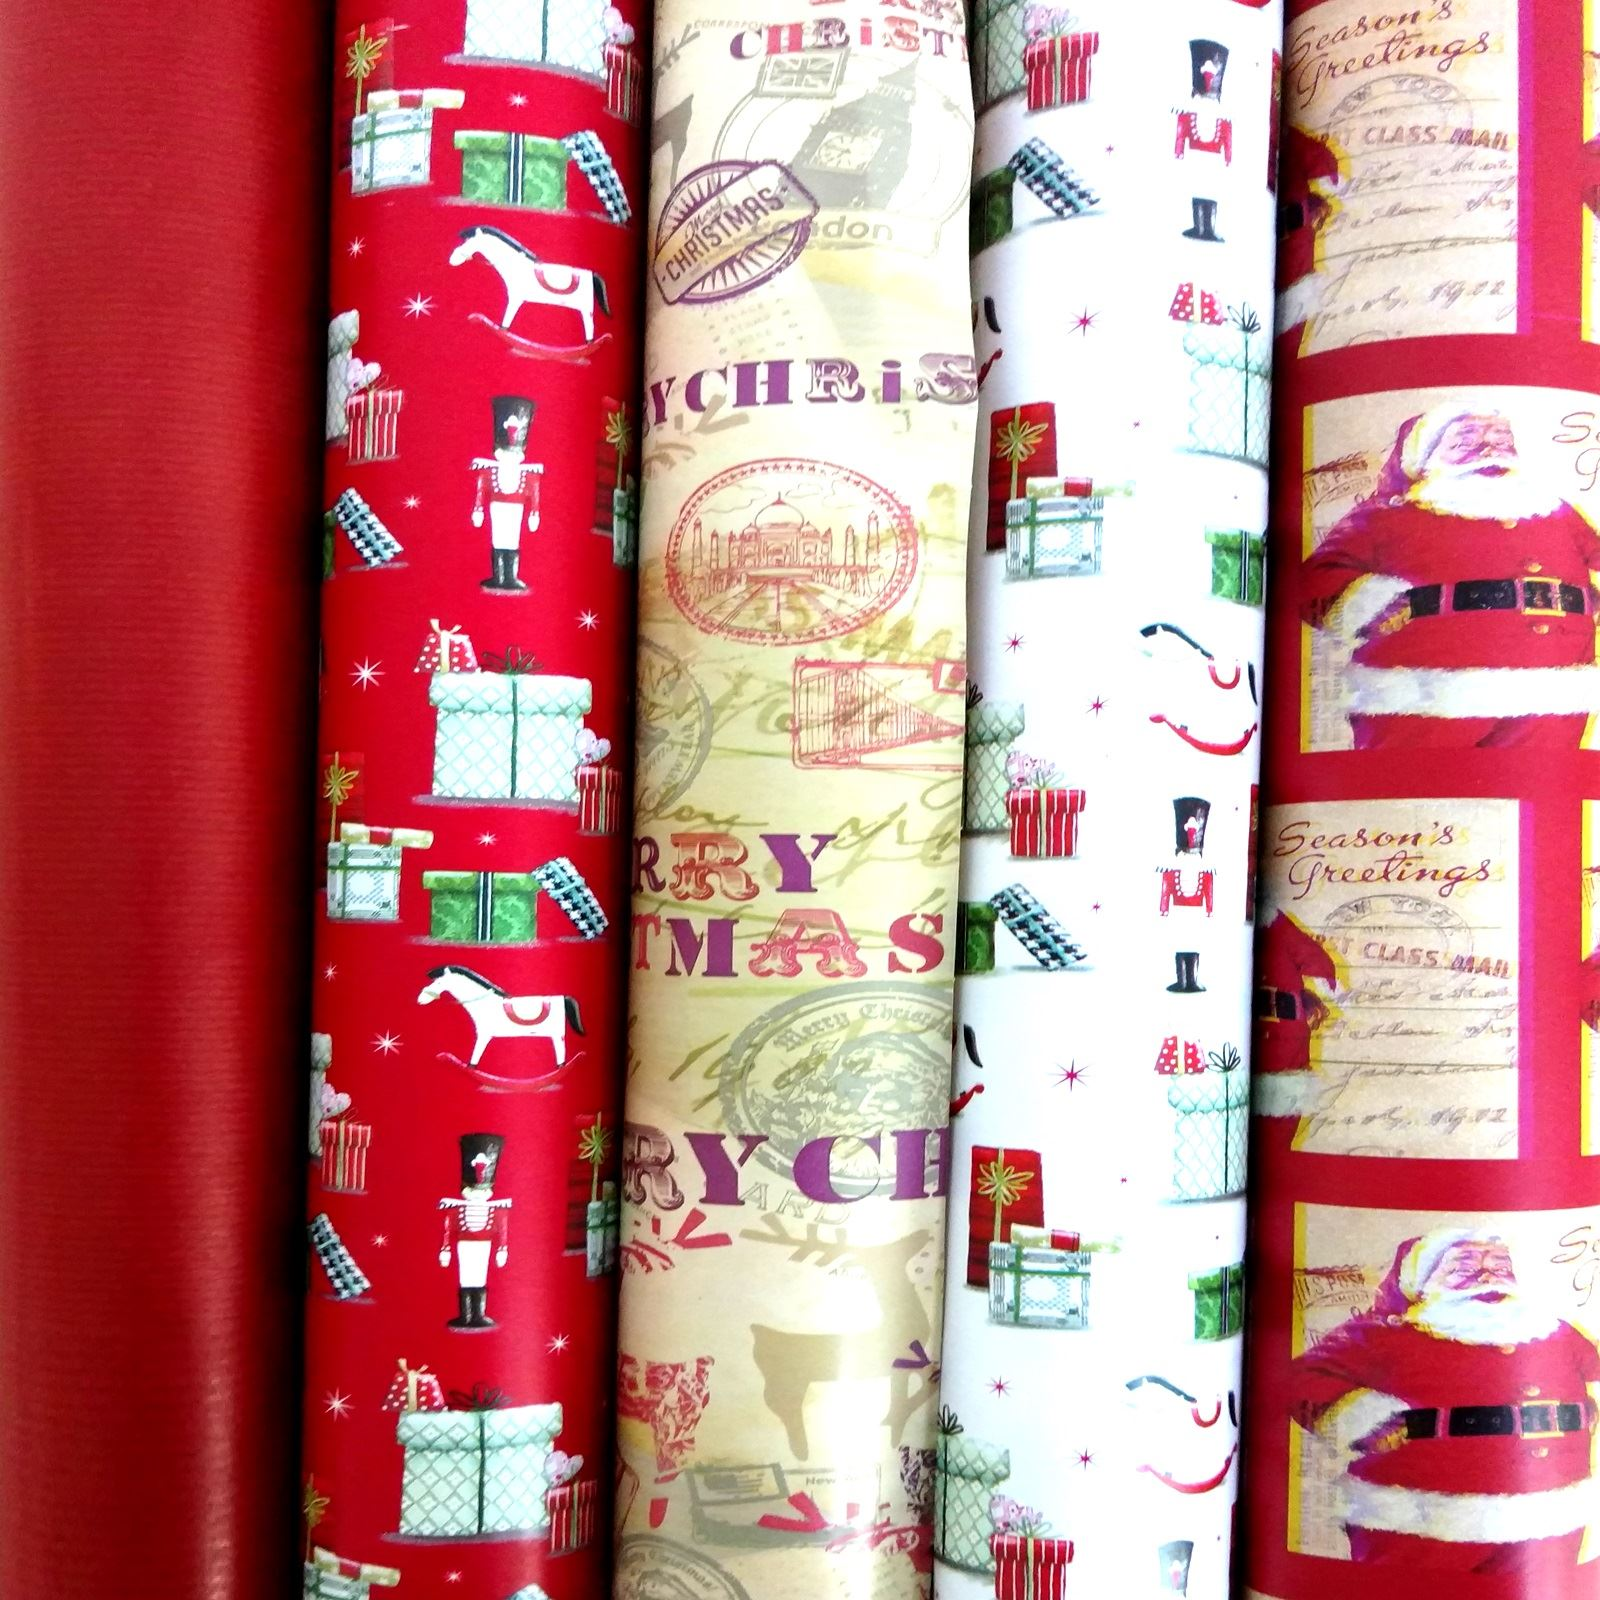 5 X Shiny Metallic Christmas Birthday Present Wrapping